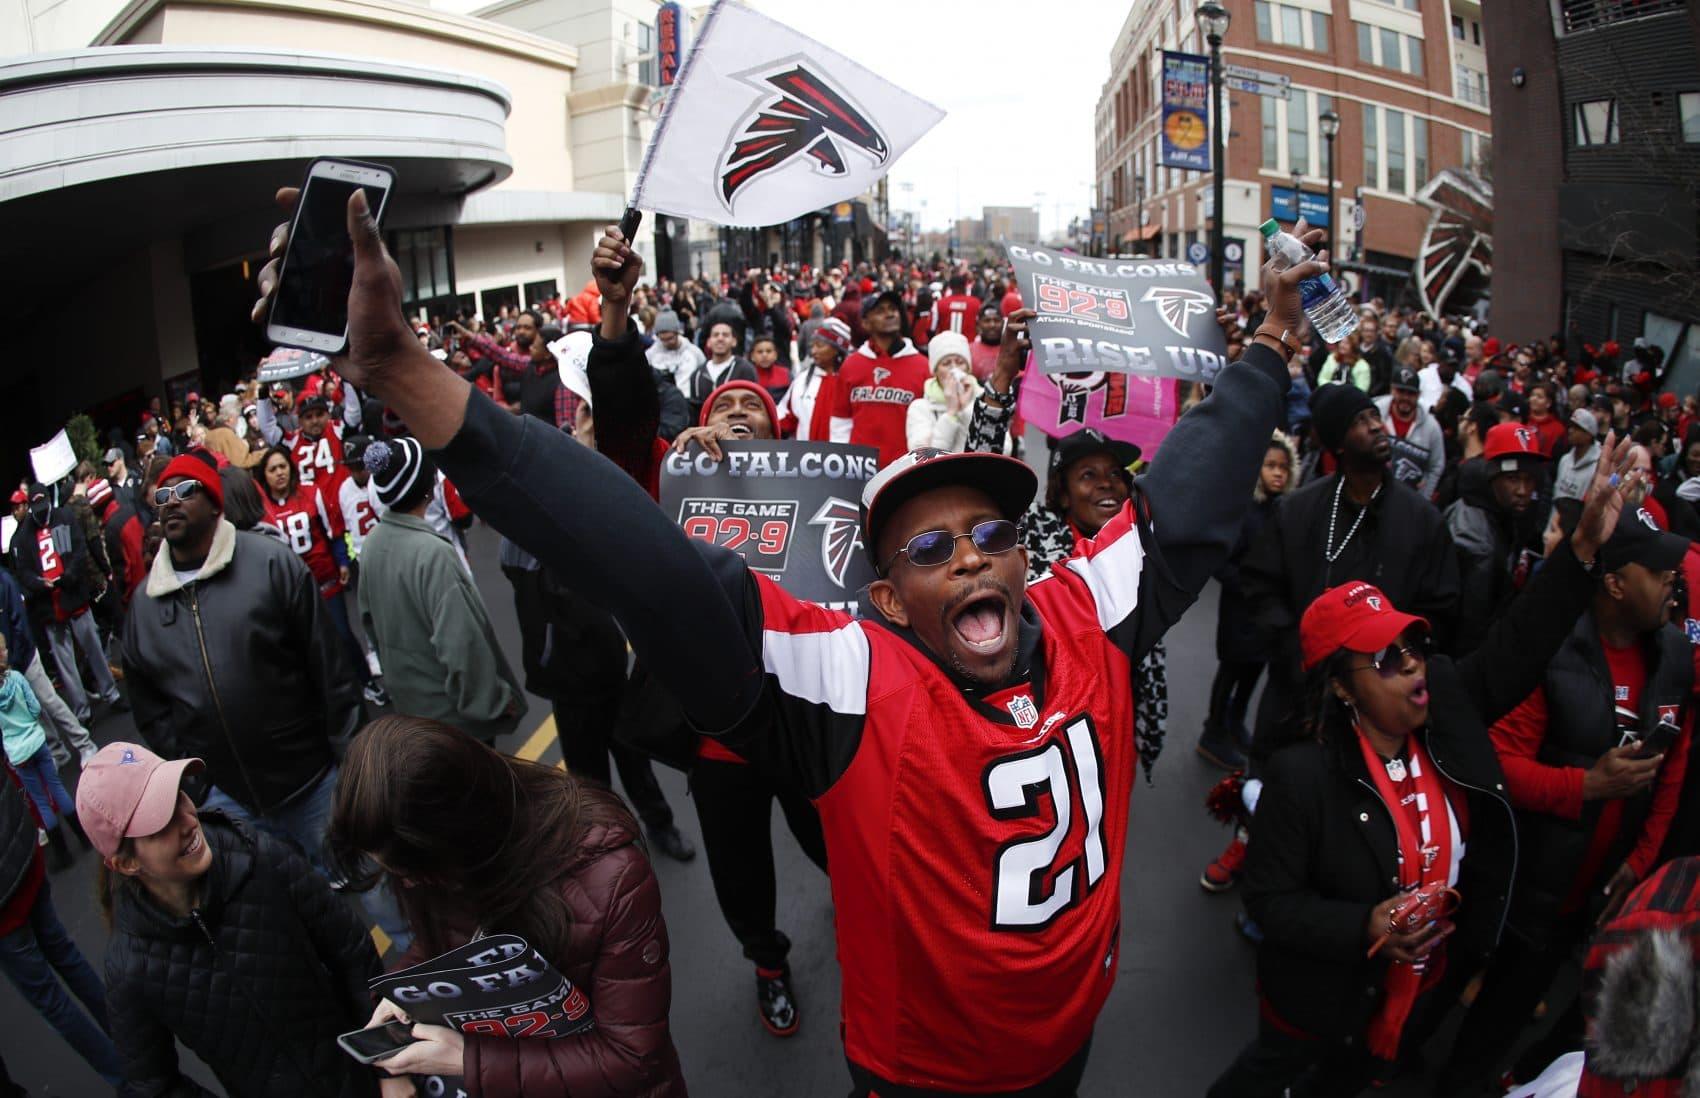 Fans cheer during a send off pep rally for the Atlanta Falcons ahead of Super Bowl LI. (John Bazemore/AP)